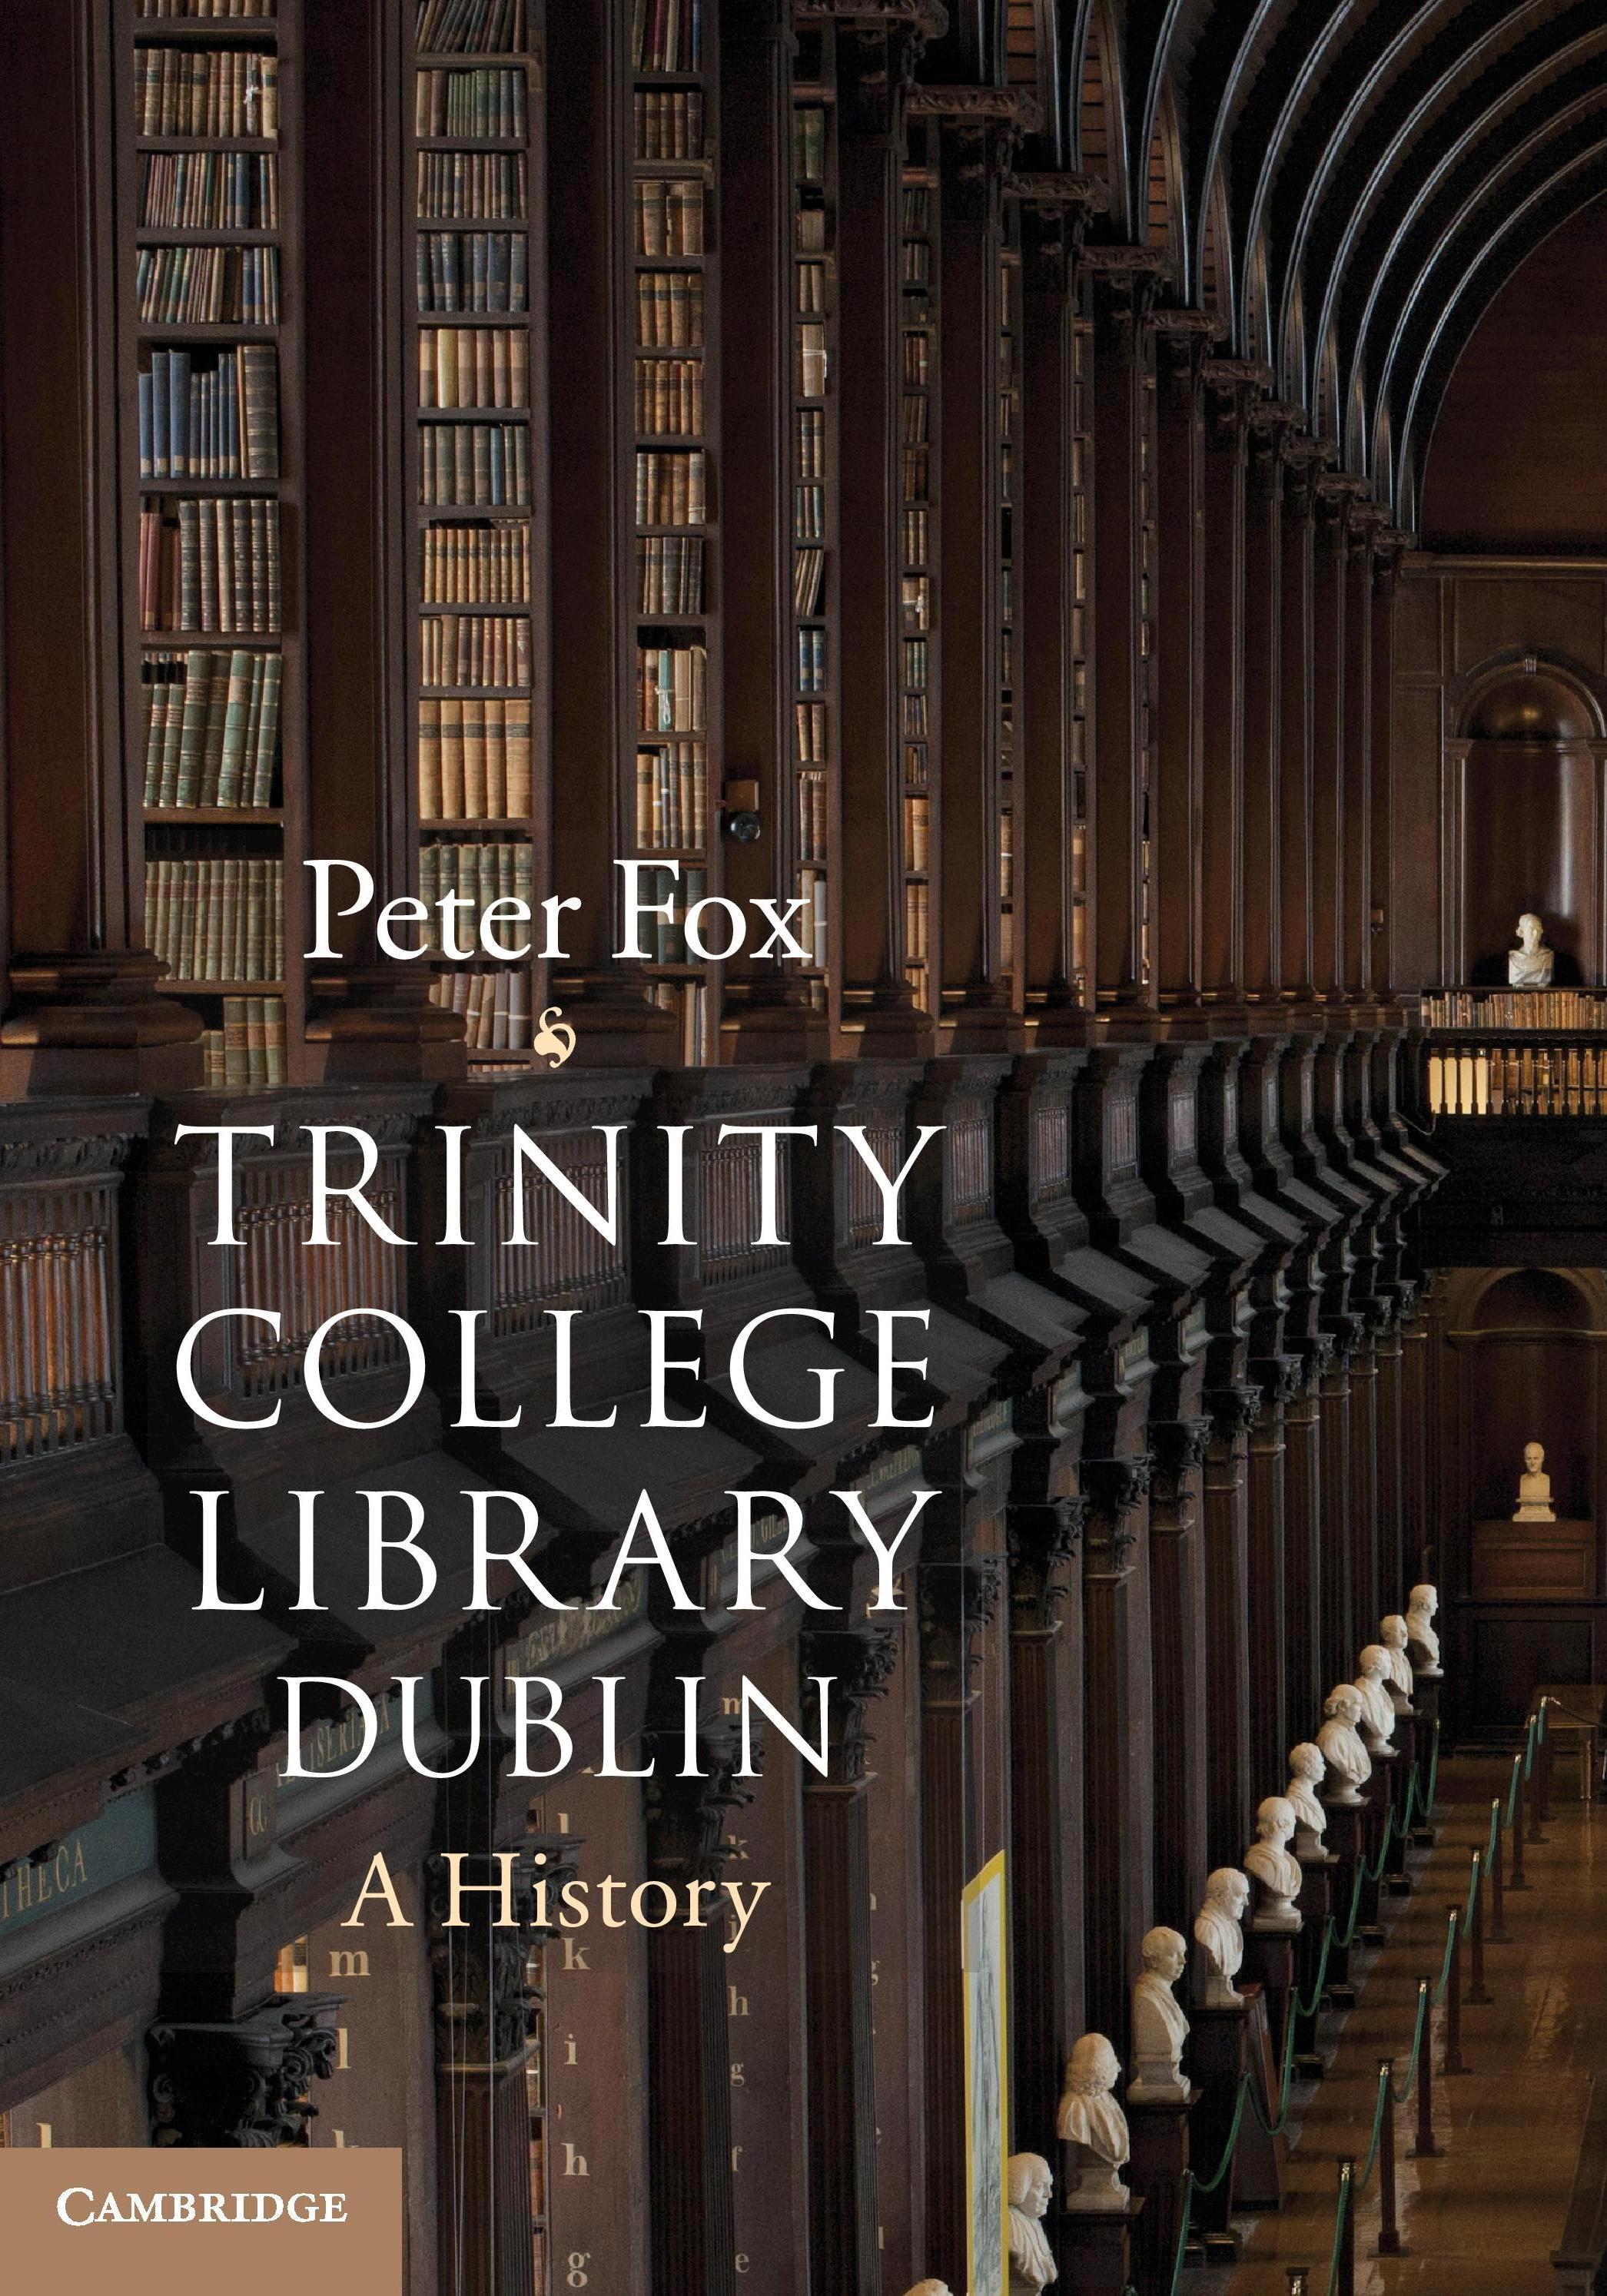 Milstein Room Cambridge University Library